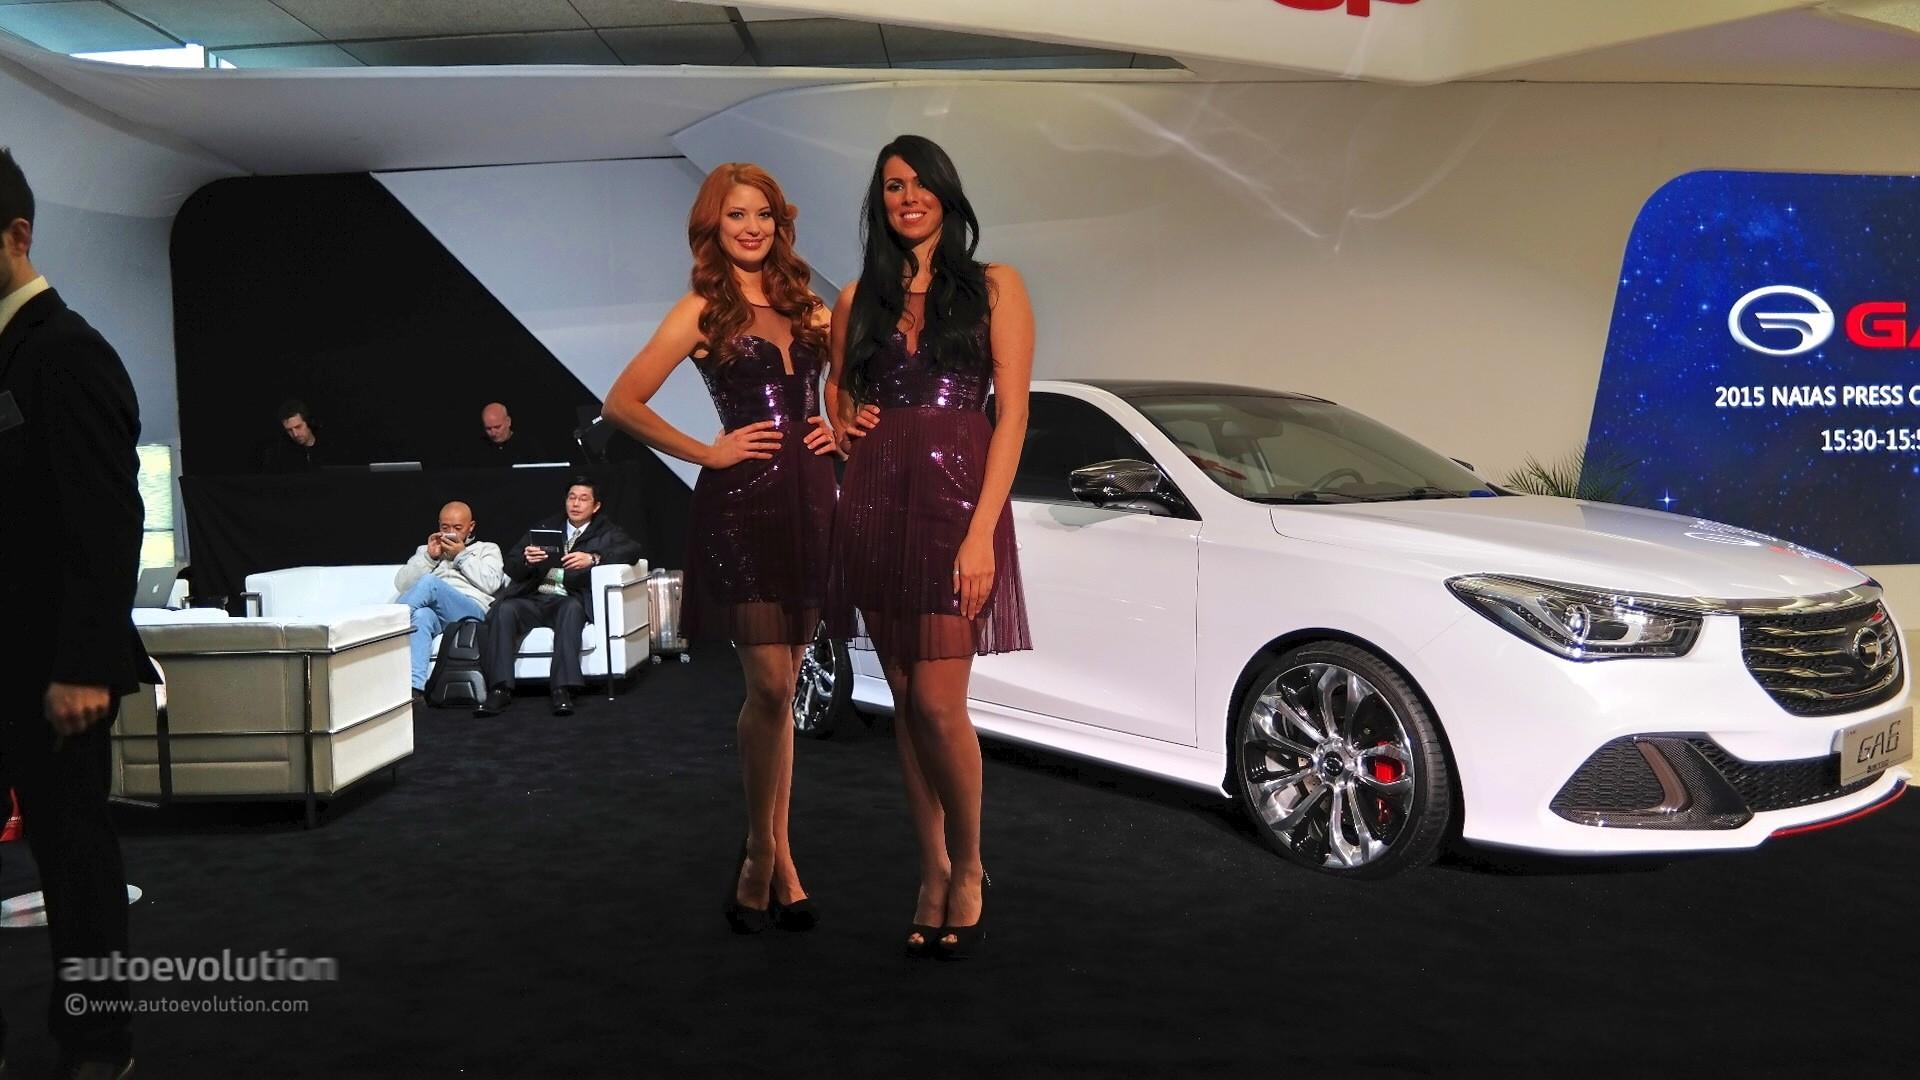 Car Show 2015 >> Foto Wanita Wanita Cantik Di Detroit Auto Show 2015 Viva